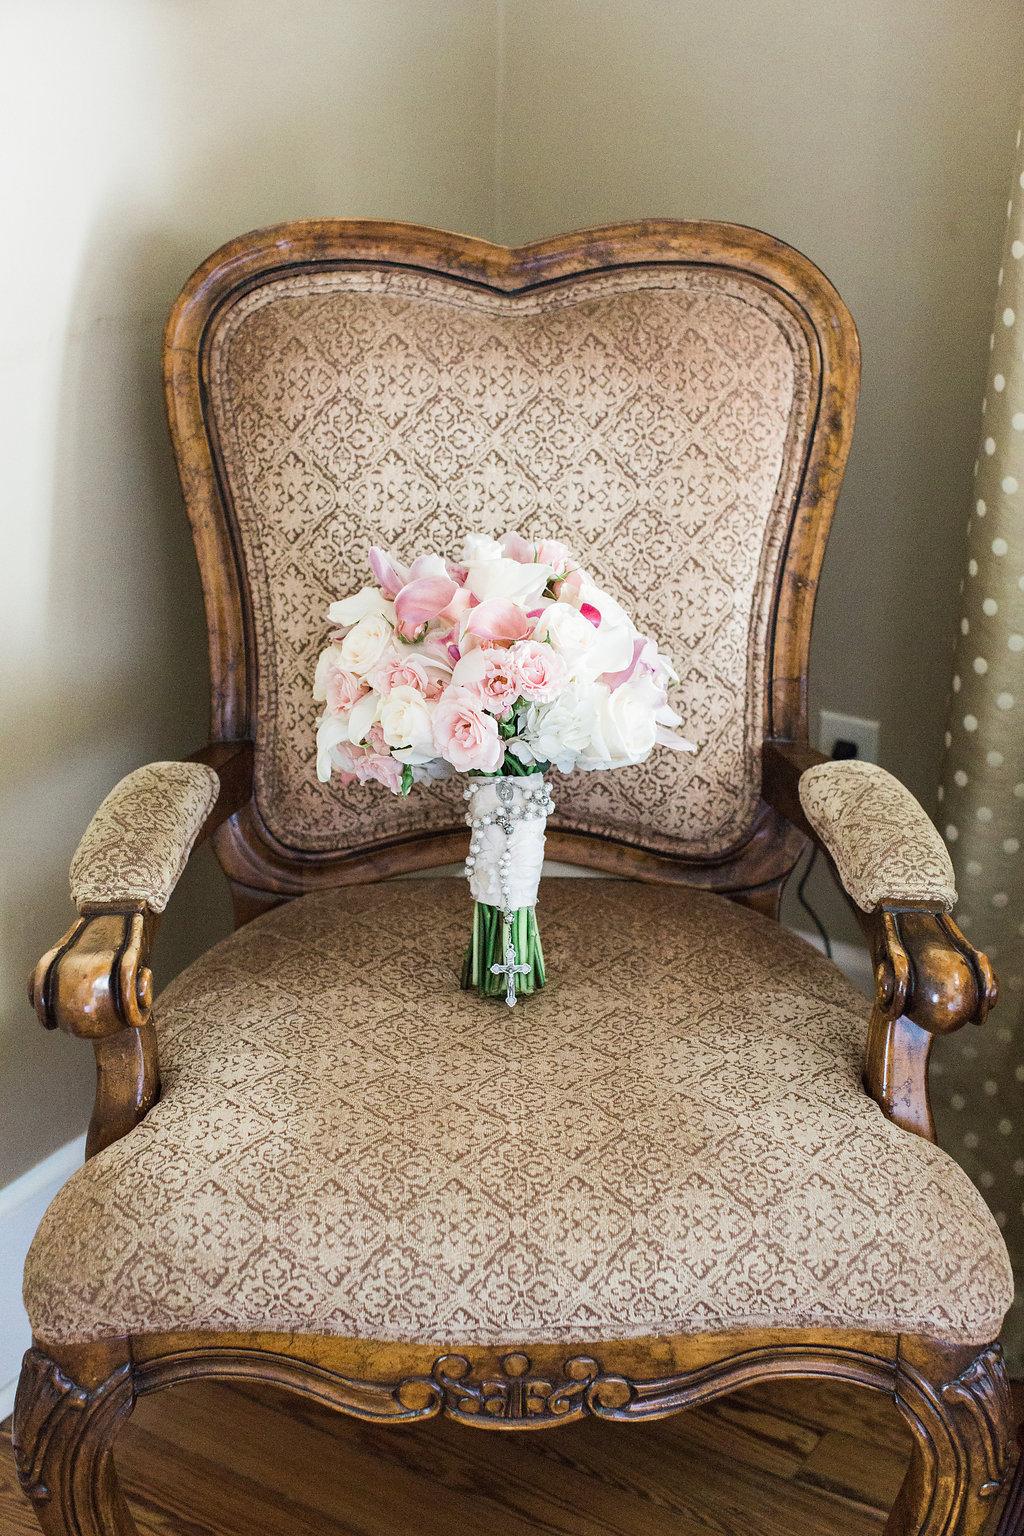 kristin-and-darren-wedding-soho-south-cafe-wormsloe-apt-b-photography-savannah-wedding-planner-savannah-weddings-southern-weddings-best-savannah-wedding-planner-2.JPG